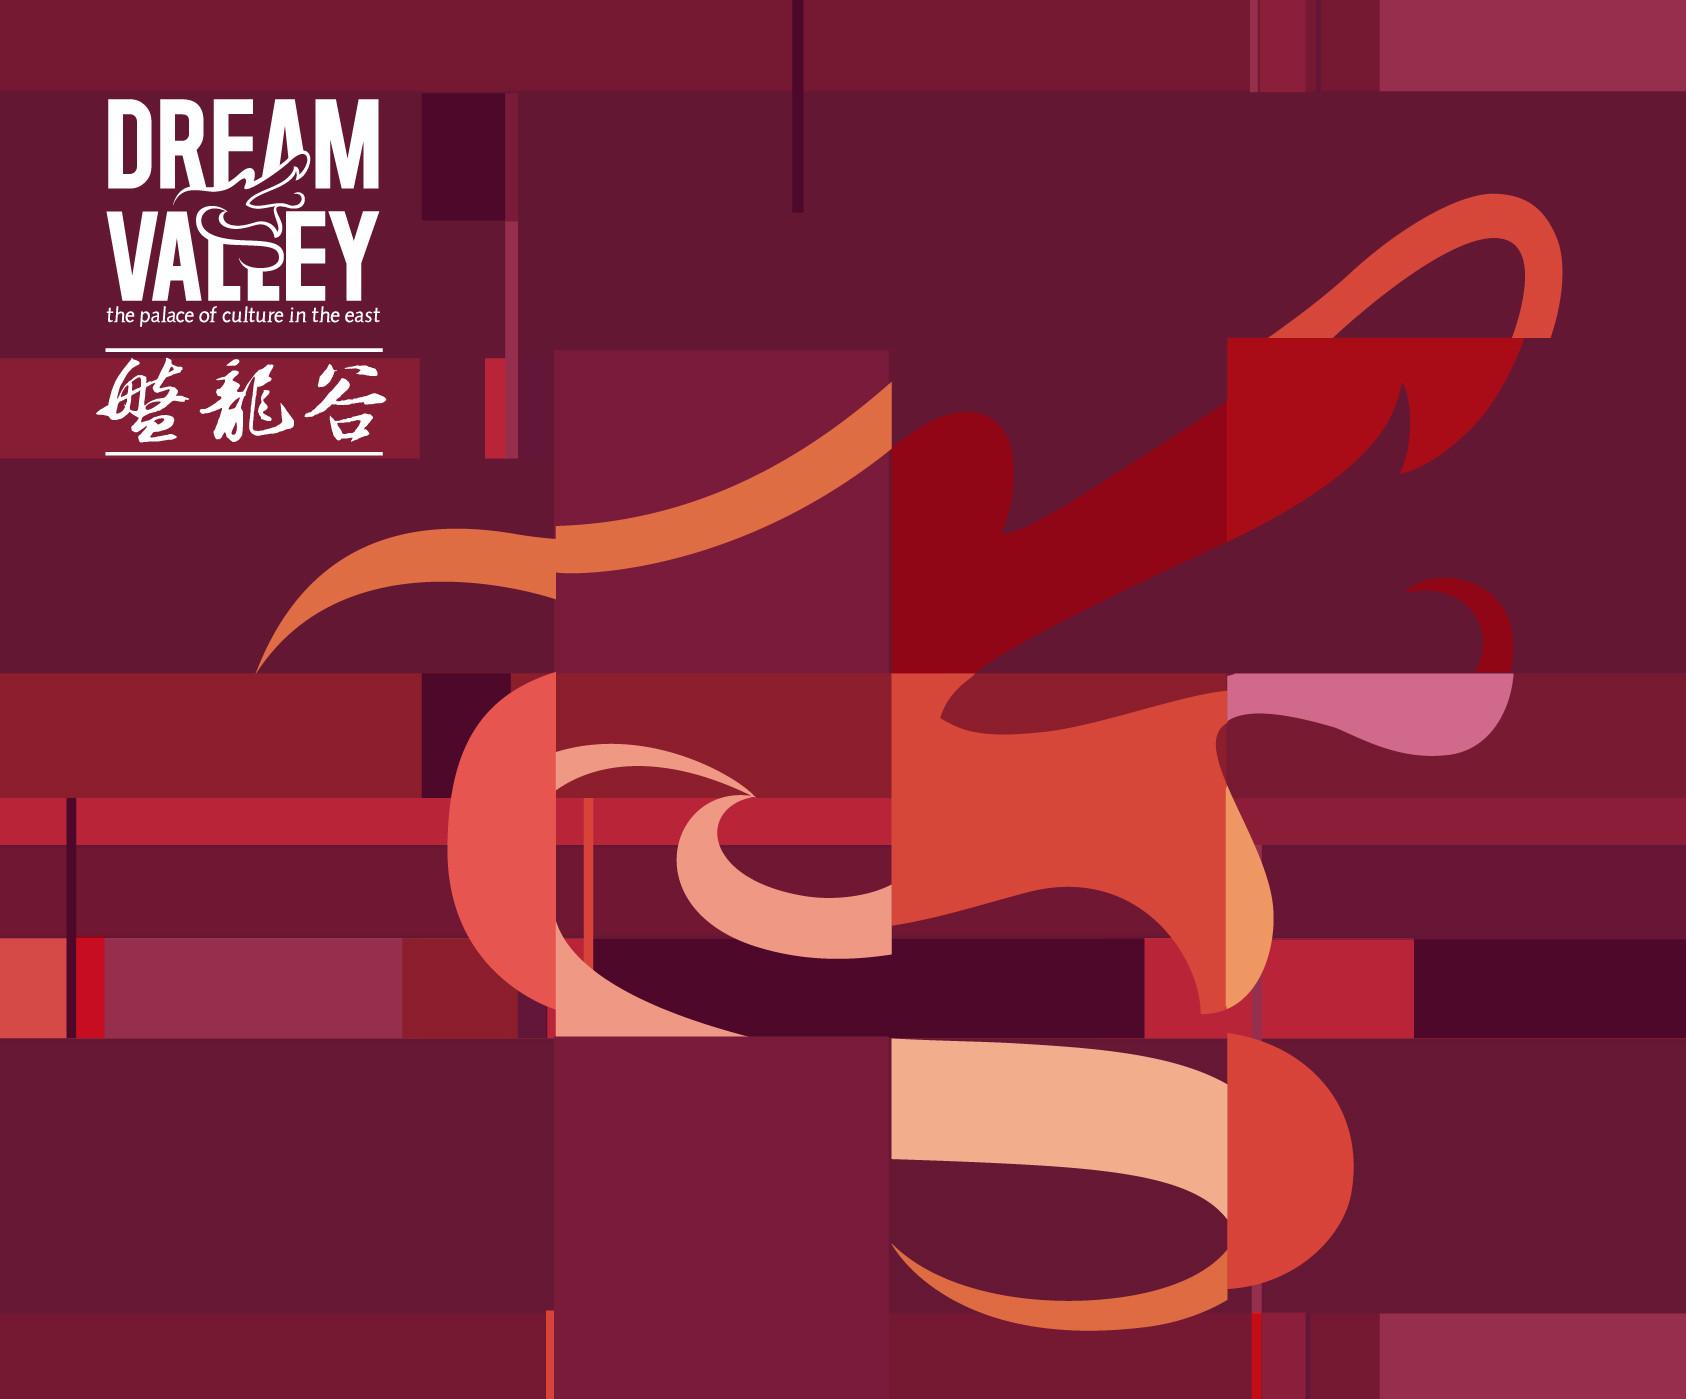 绿地-盘龙谷 DREAM VALLEY